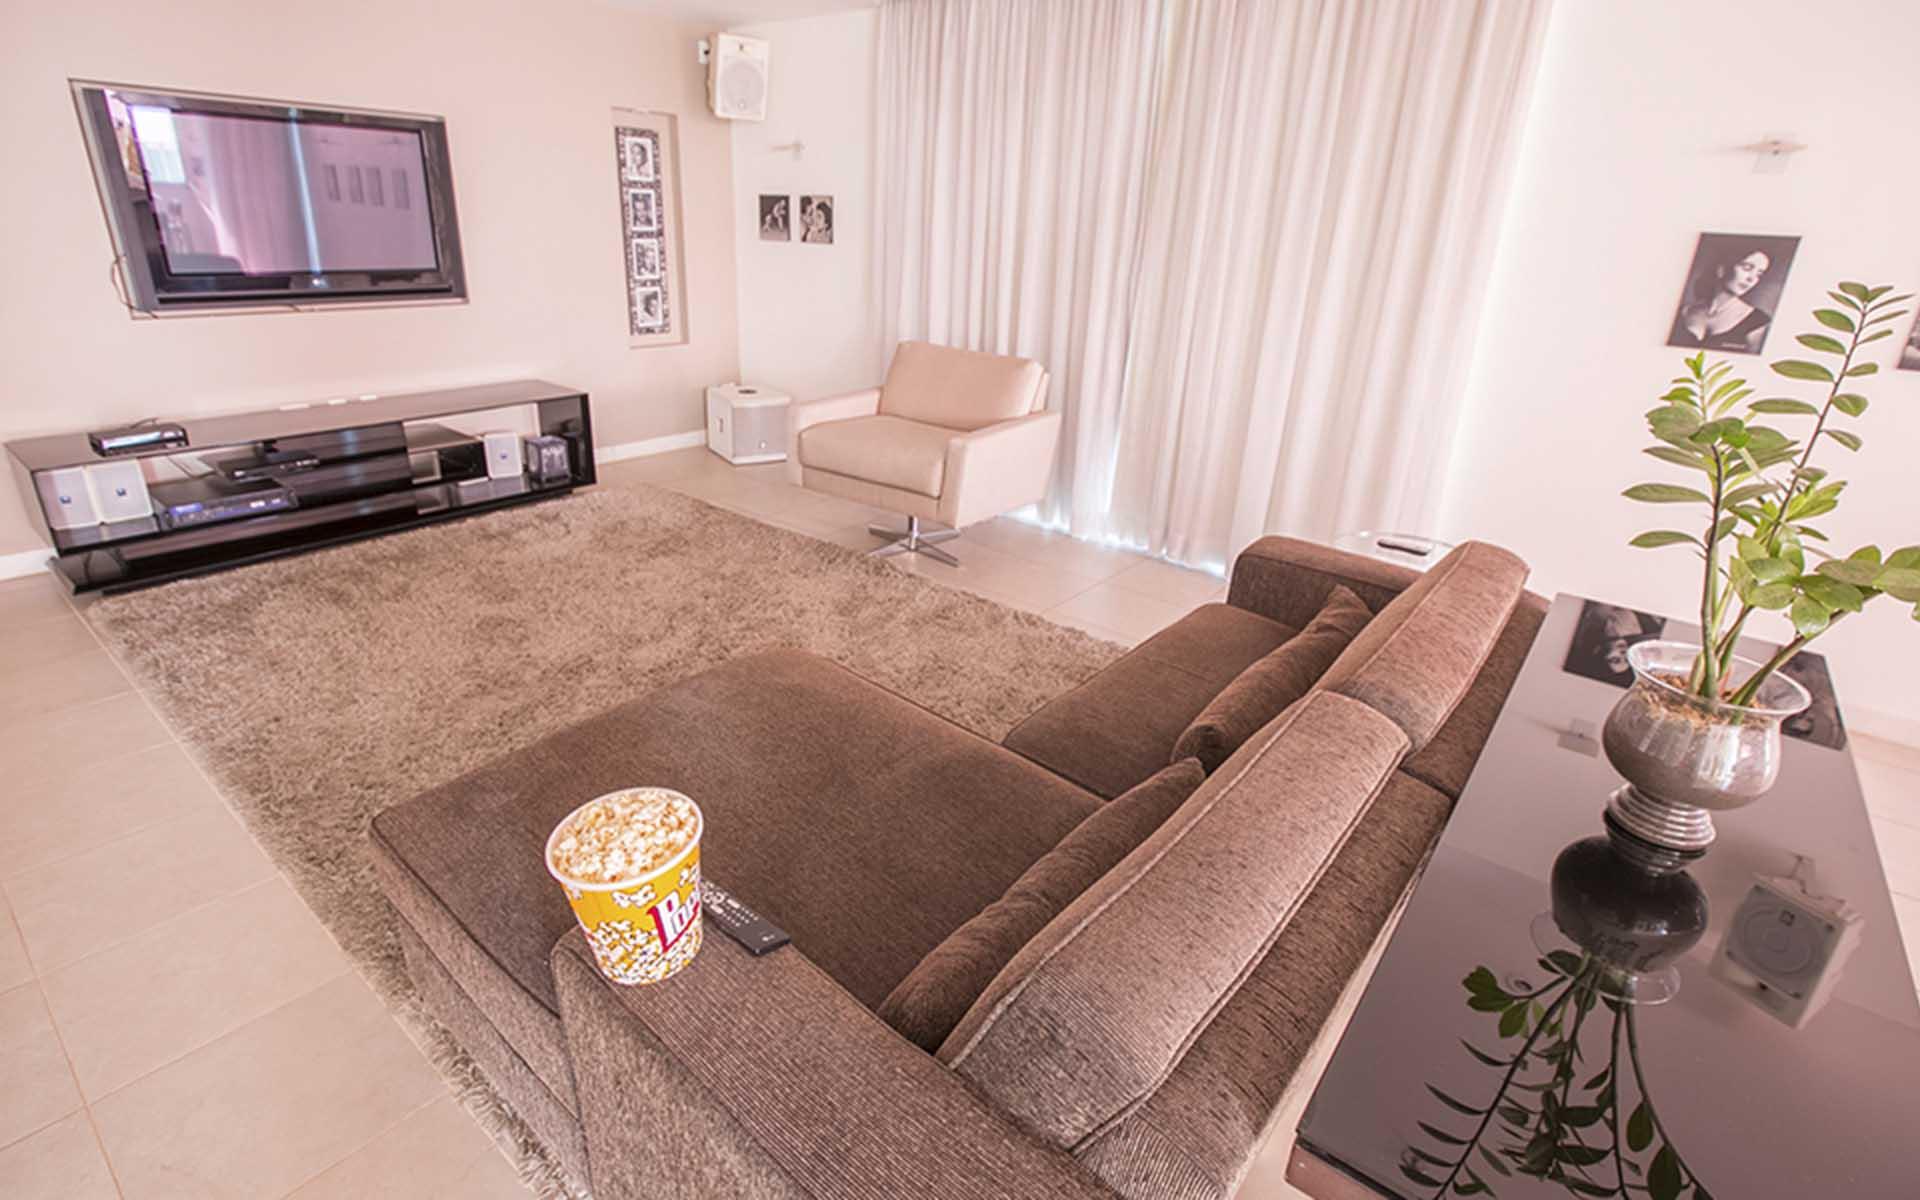 espaço gourmet do apart hotel flat em brasilia biarritz hplus long stay